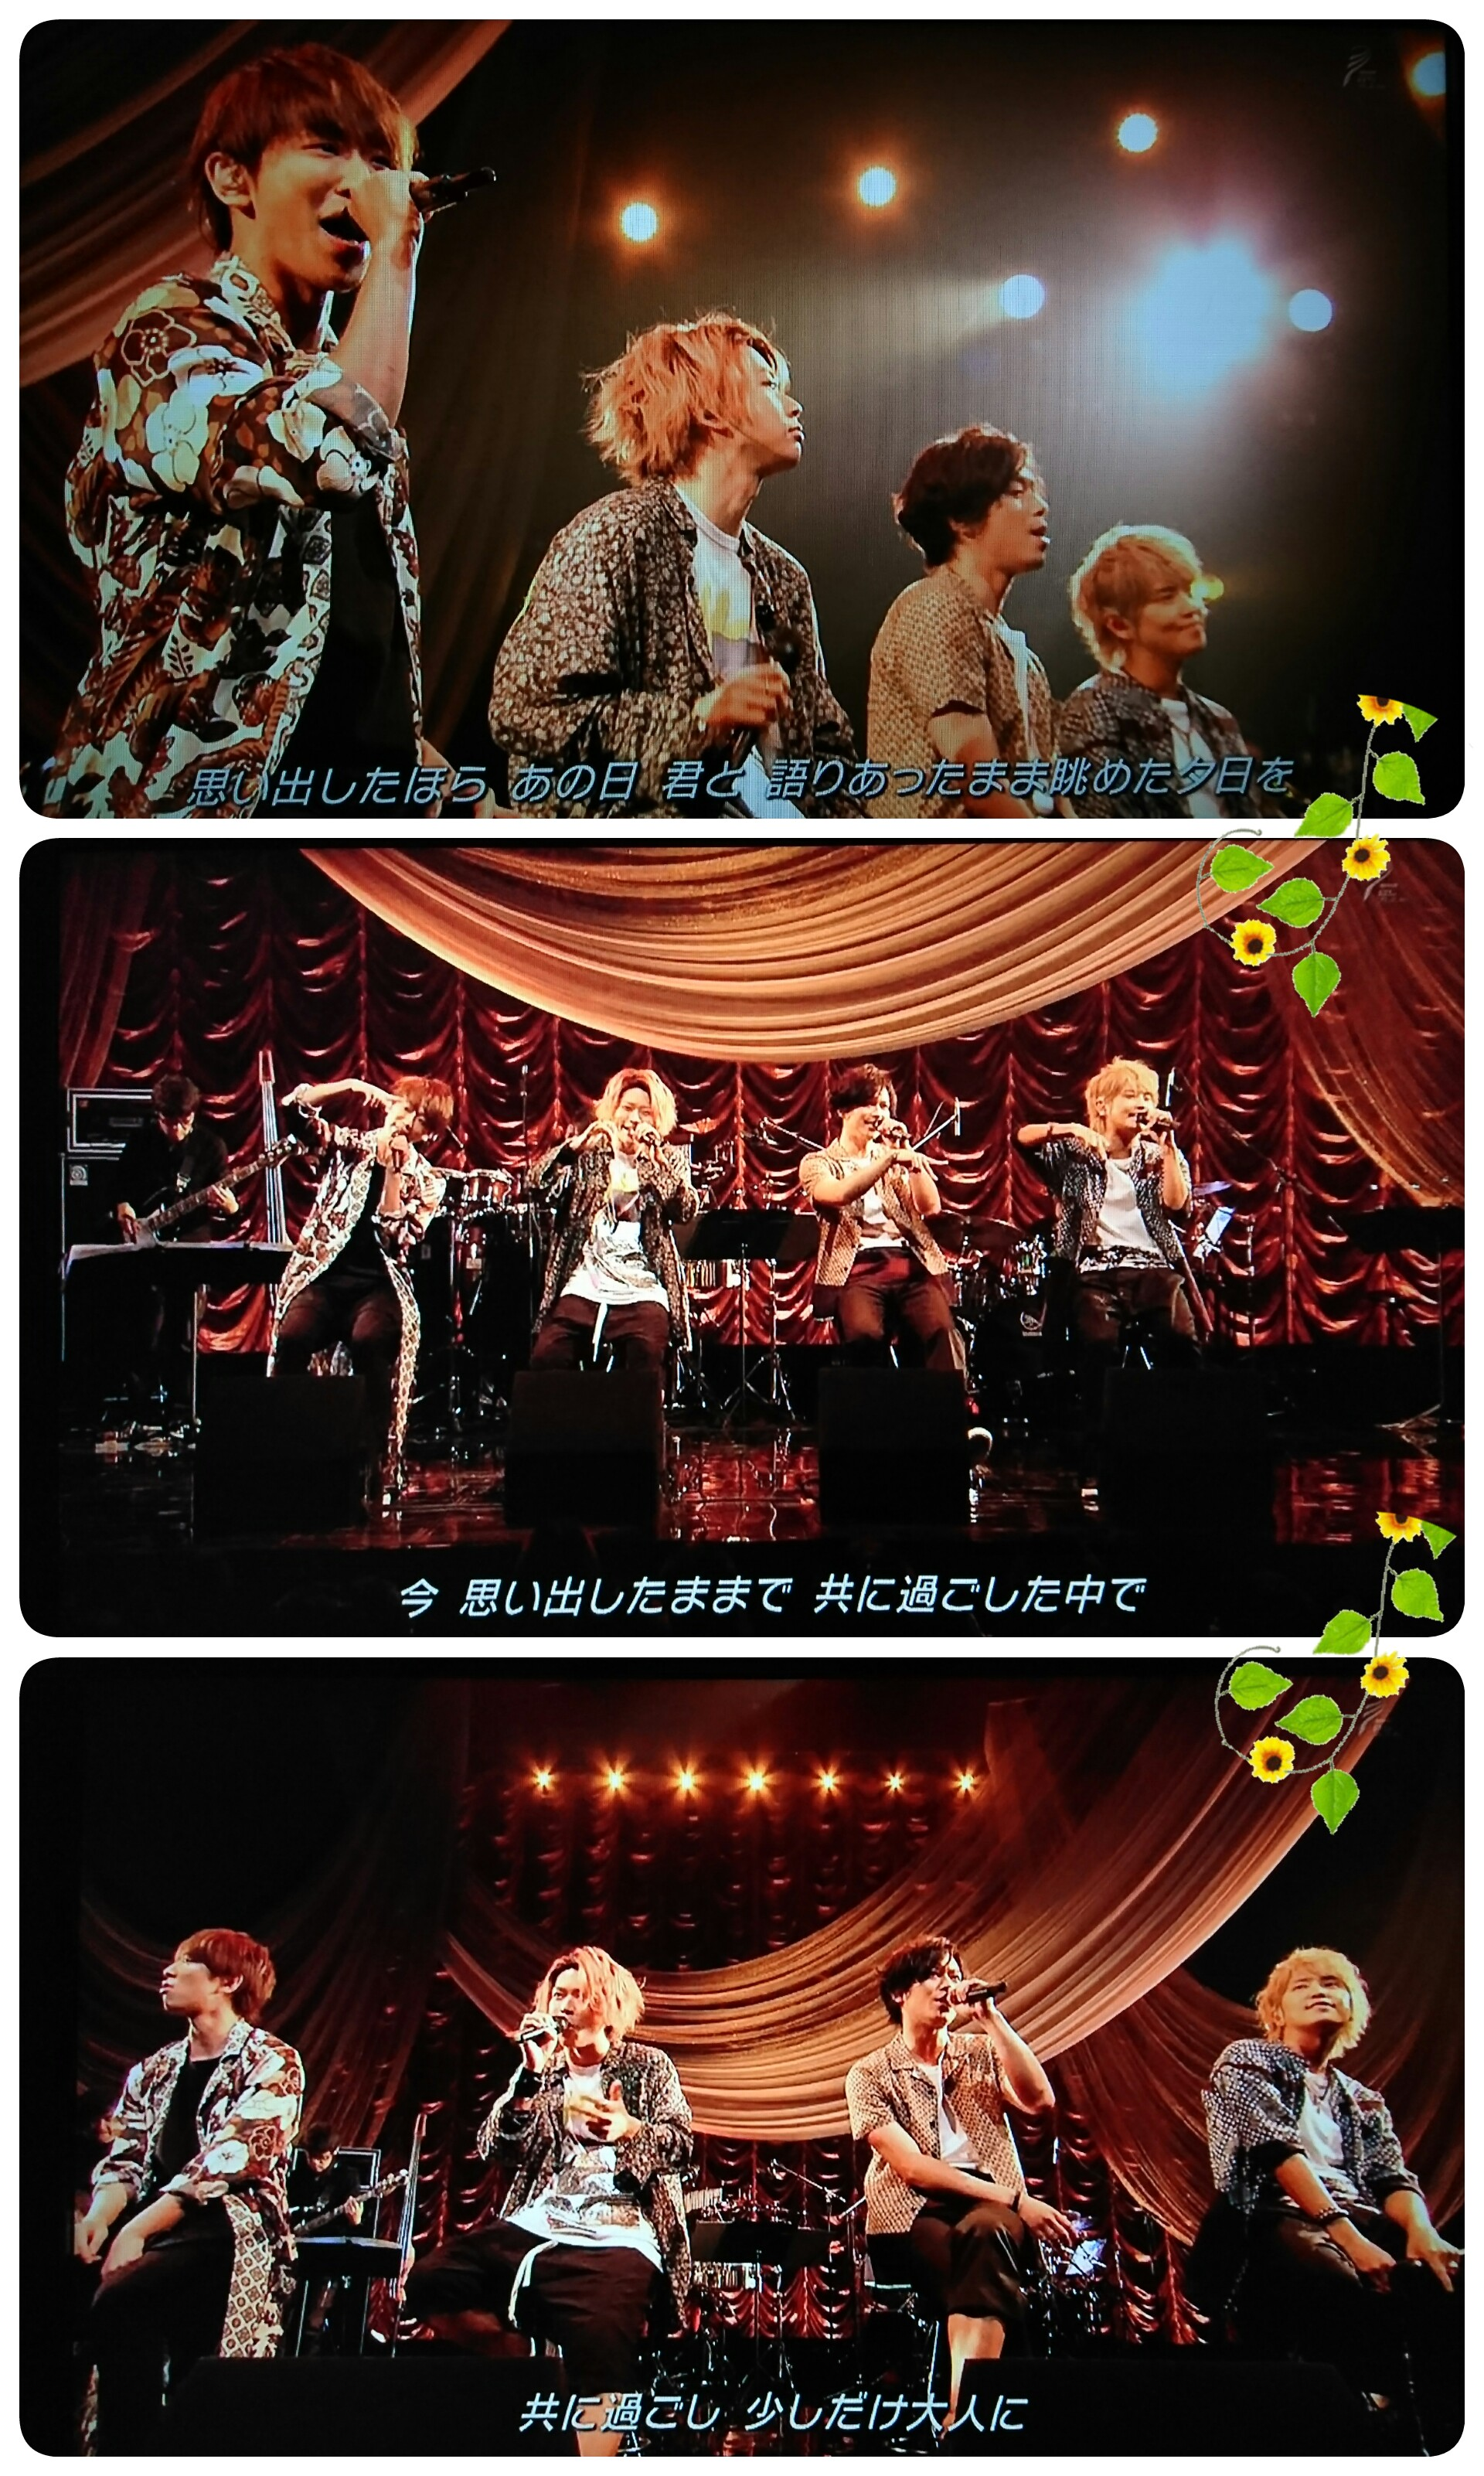 f:id:sunflower-shigeaki:20170831000949j:image